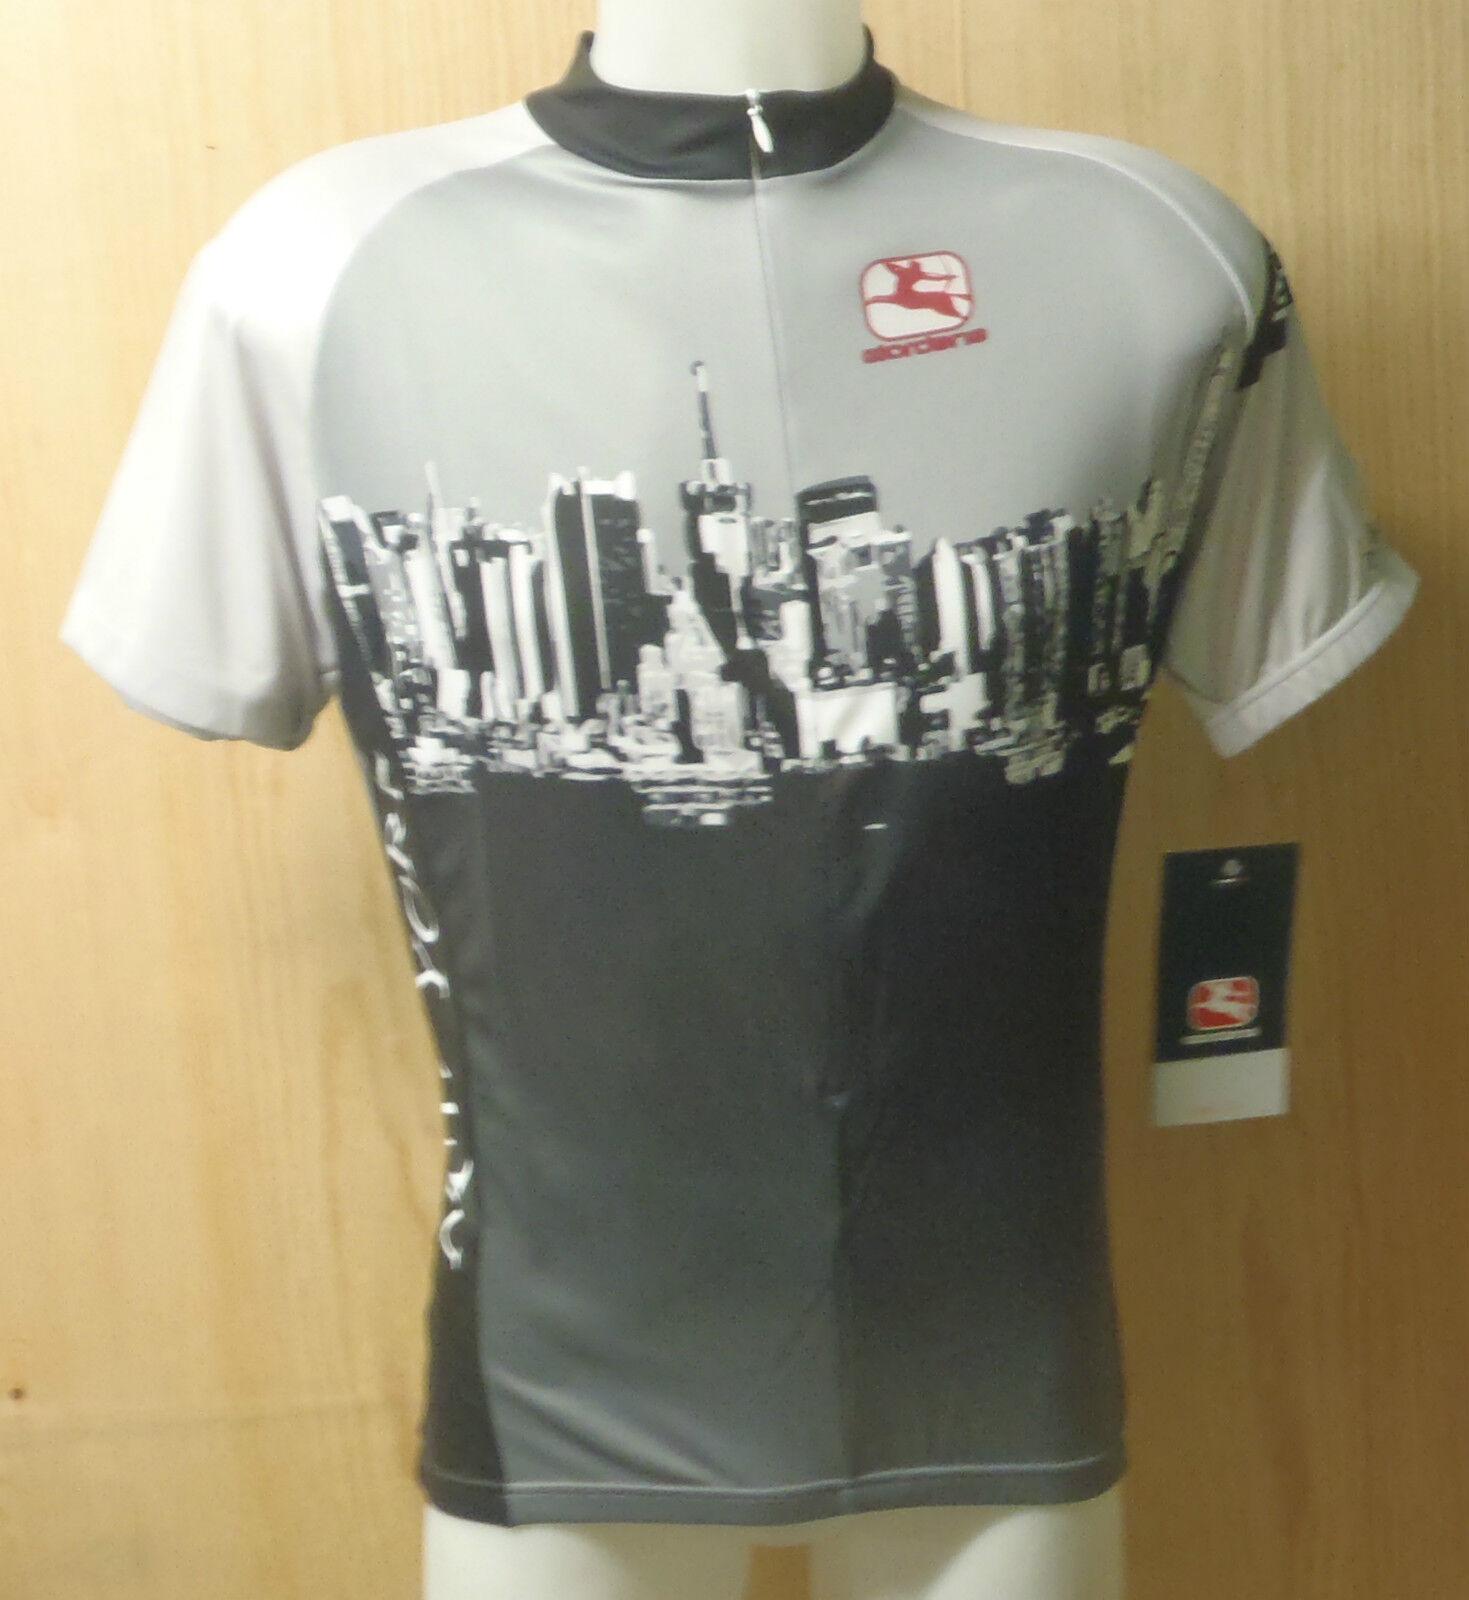 GIORDANA NEW YORK GENTS CYCLING JERSEY M L XL XXL 3XL UK P&P FREE